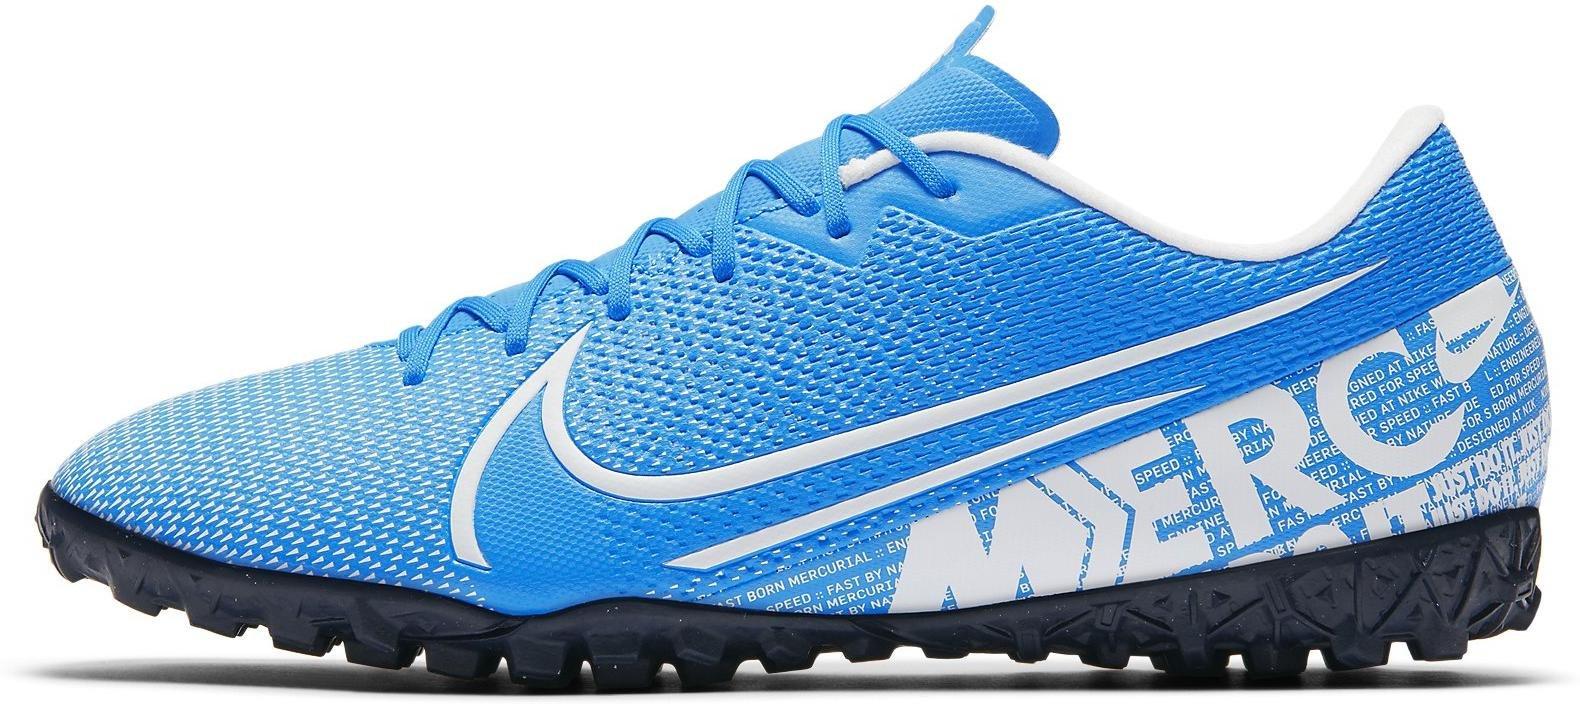 Kopačky Nike VAPOR 13 ACADEMY TF modrá